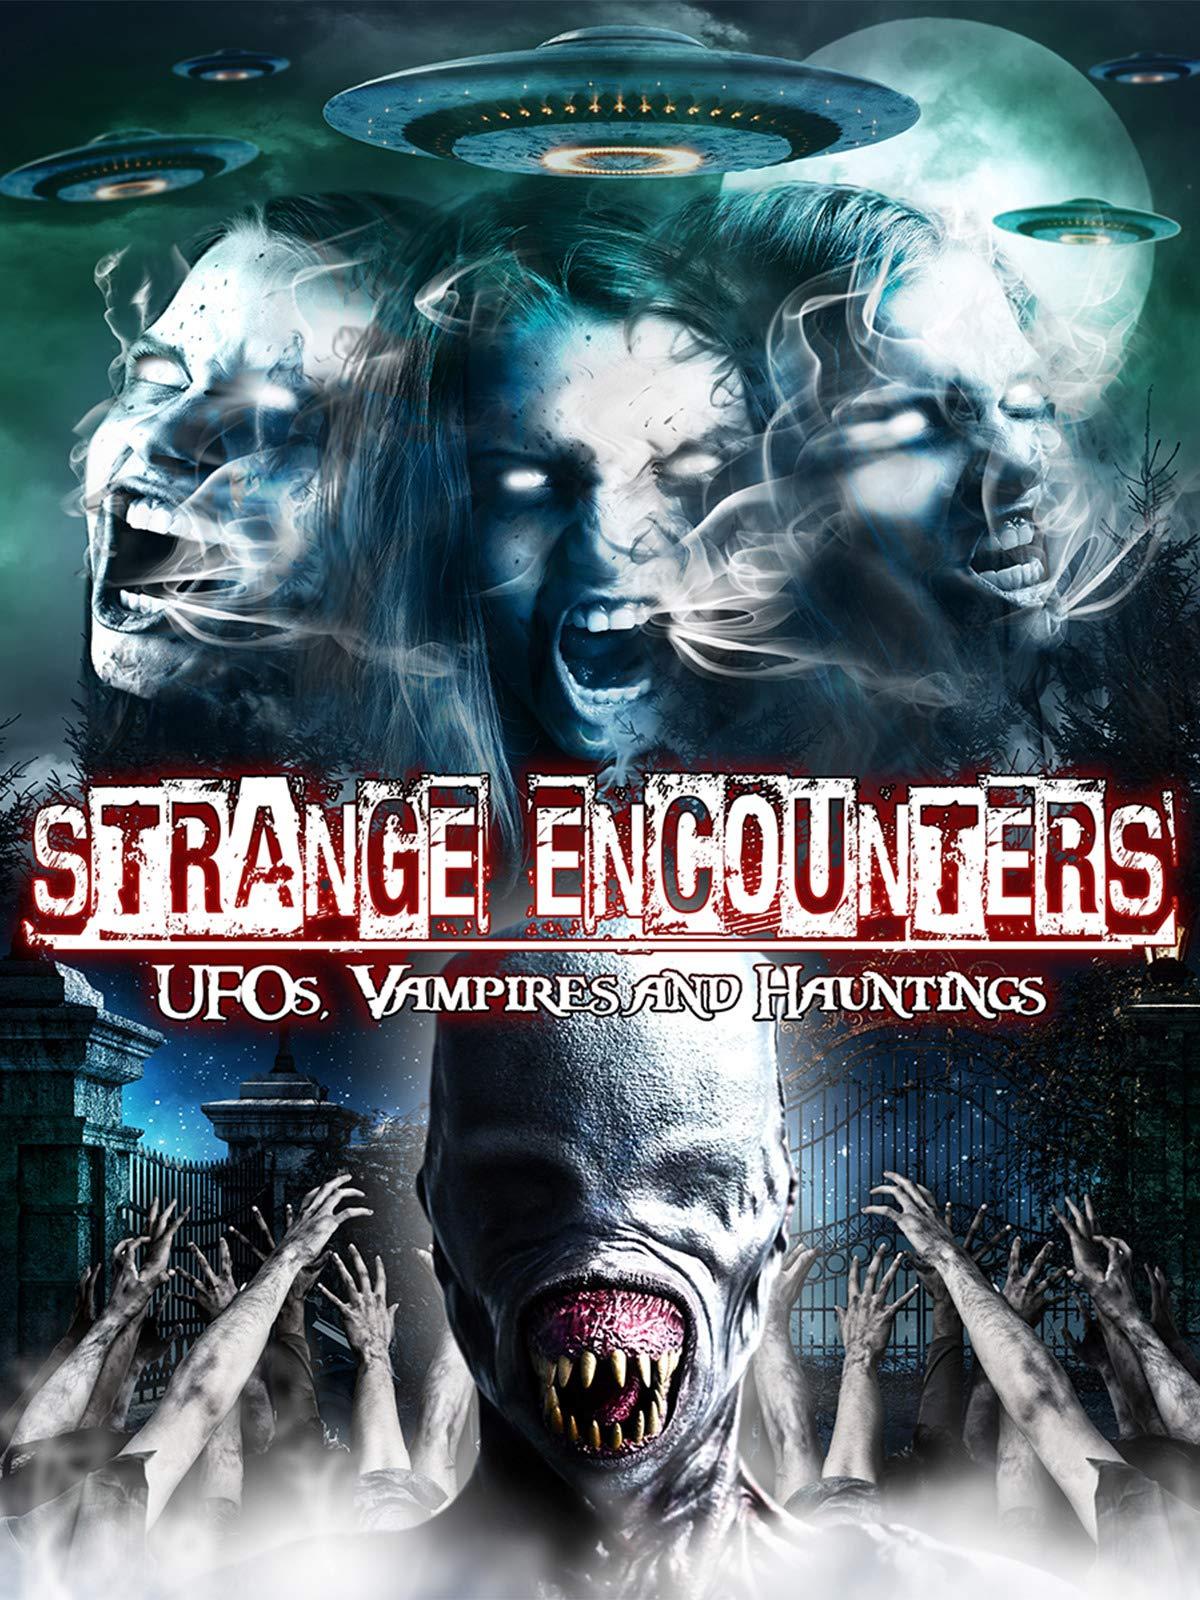 Strange Encounters, Vampires, UFOs and Hauntings